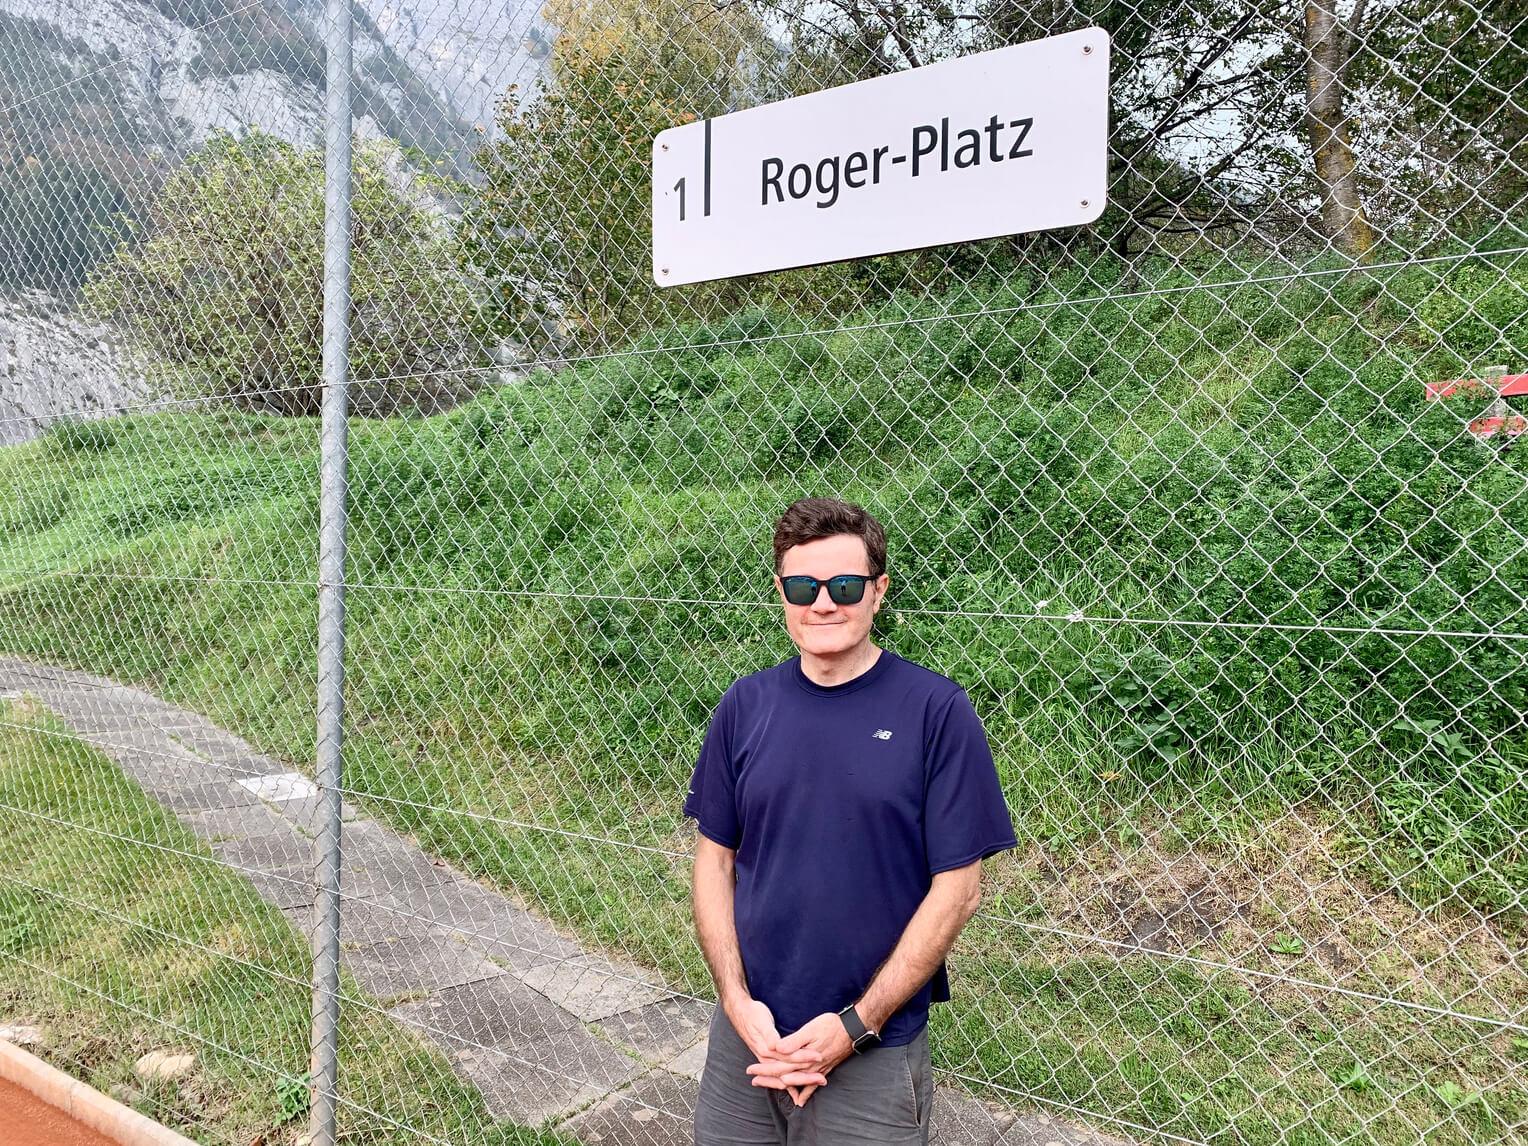 Footsteps of Federer Book - Tennisclub Feldberg (Copyright Dave Seminara)